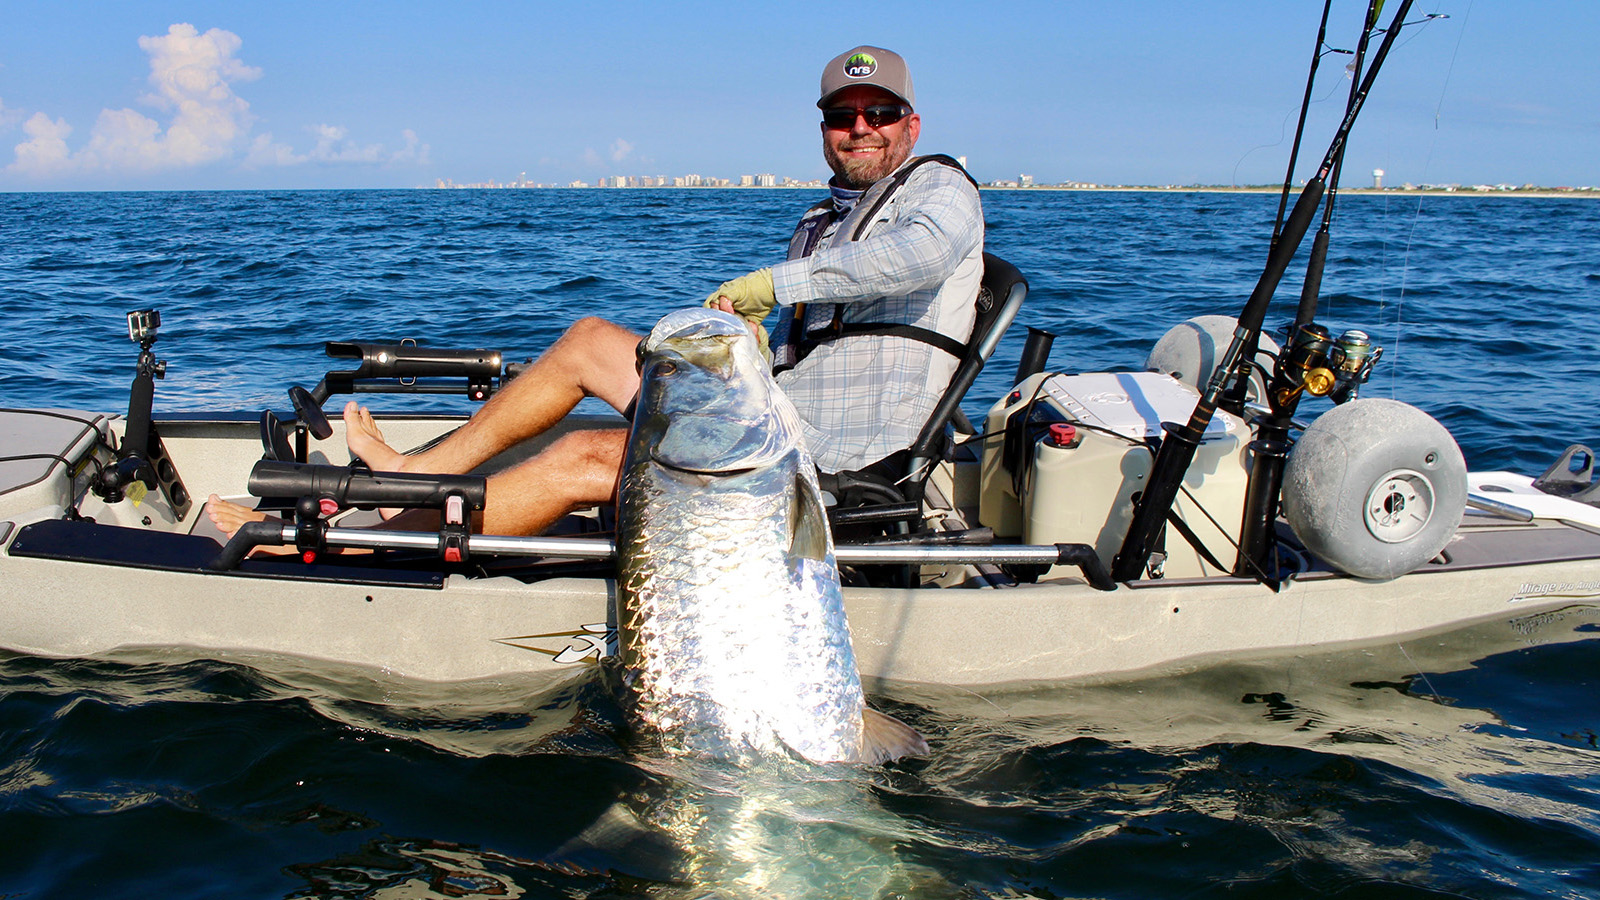 Torqeedo Blog - Kayak Bass Fishing Championship Winner - e-mobility on the  water